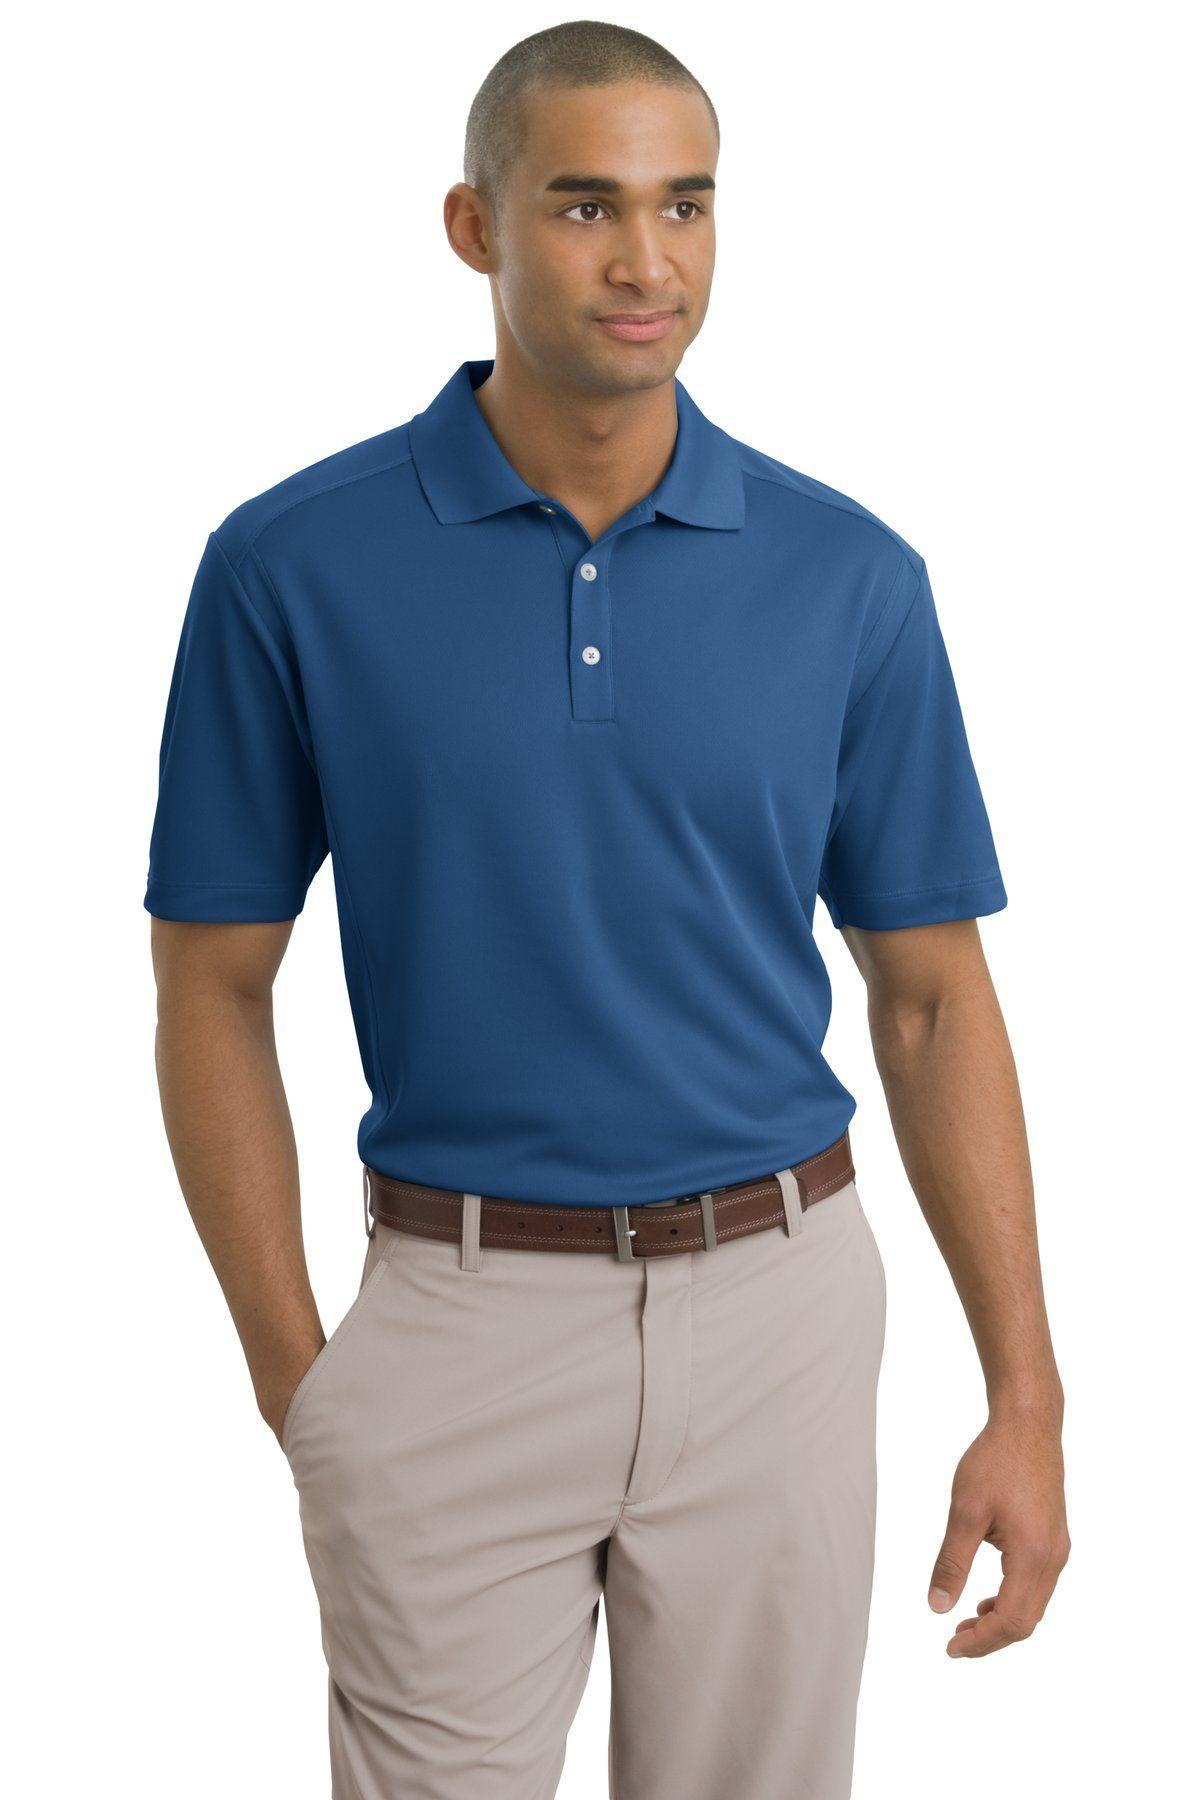 dri fit t shirts wholesale